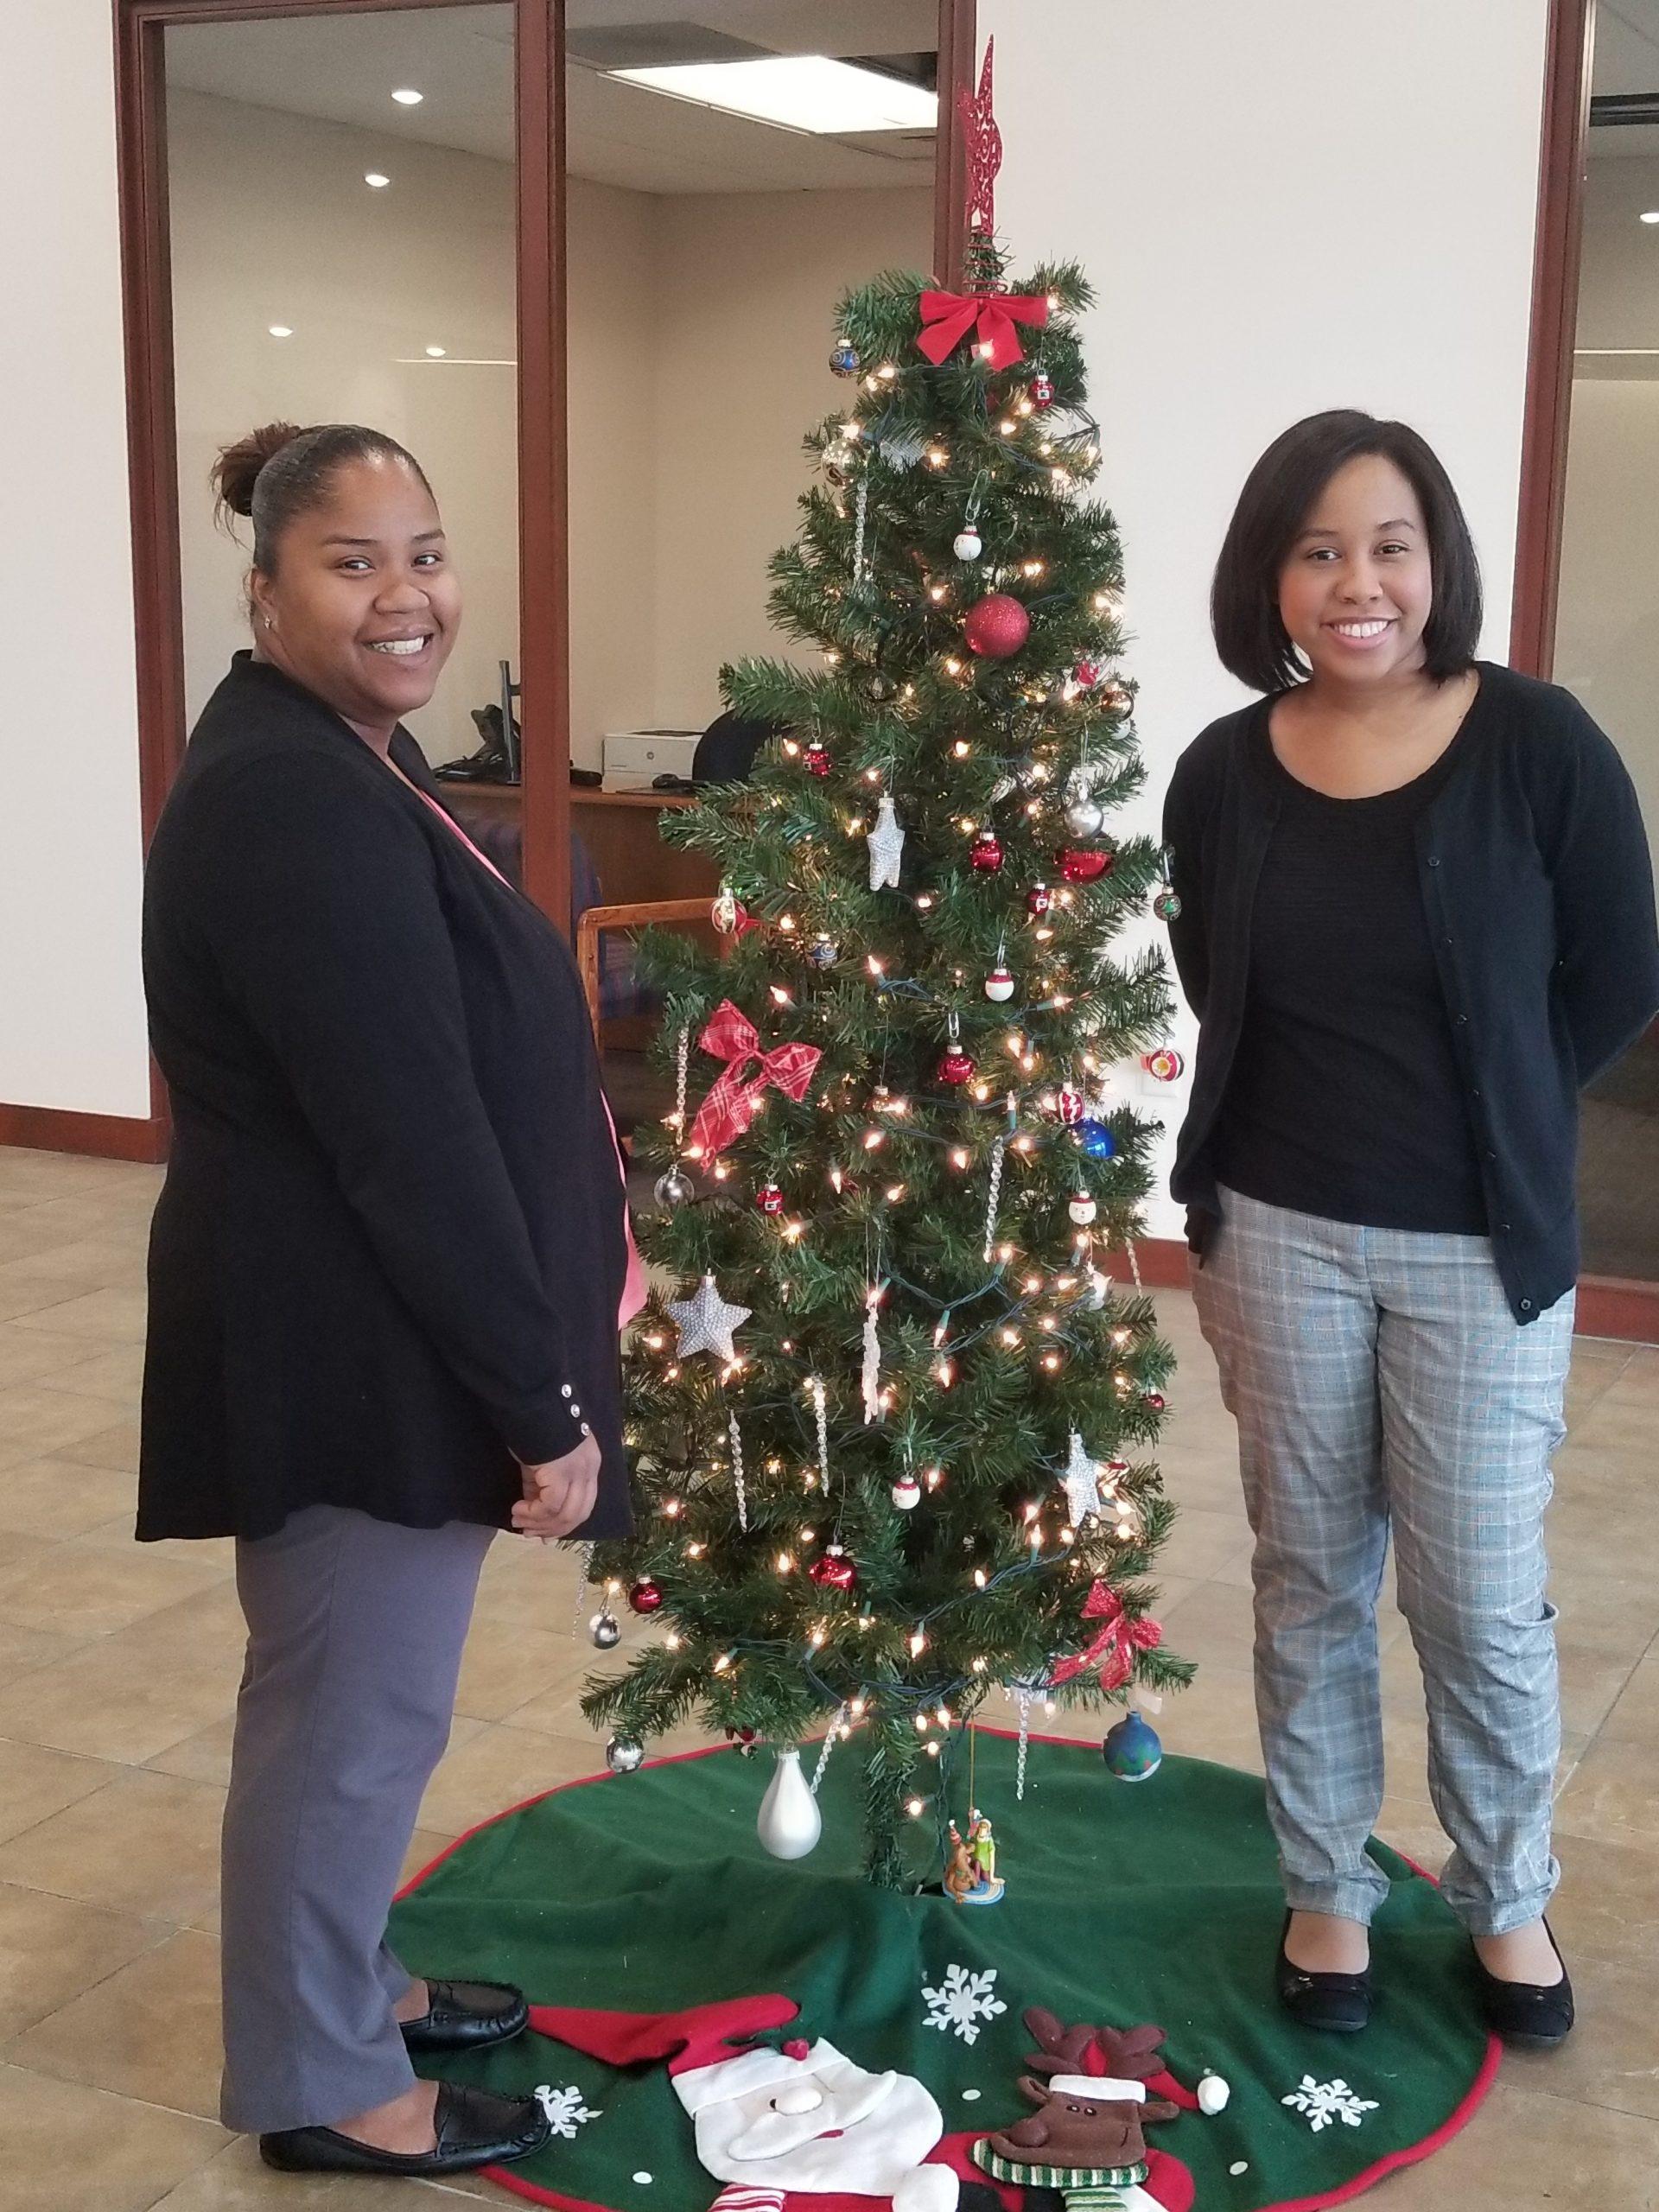 12-04-2018 Yani & Mayra - Marion Oaks Branch Christmas Tree